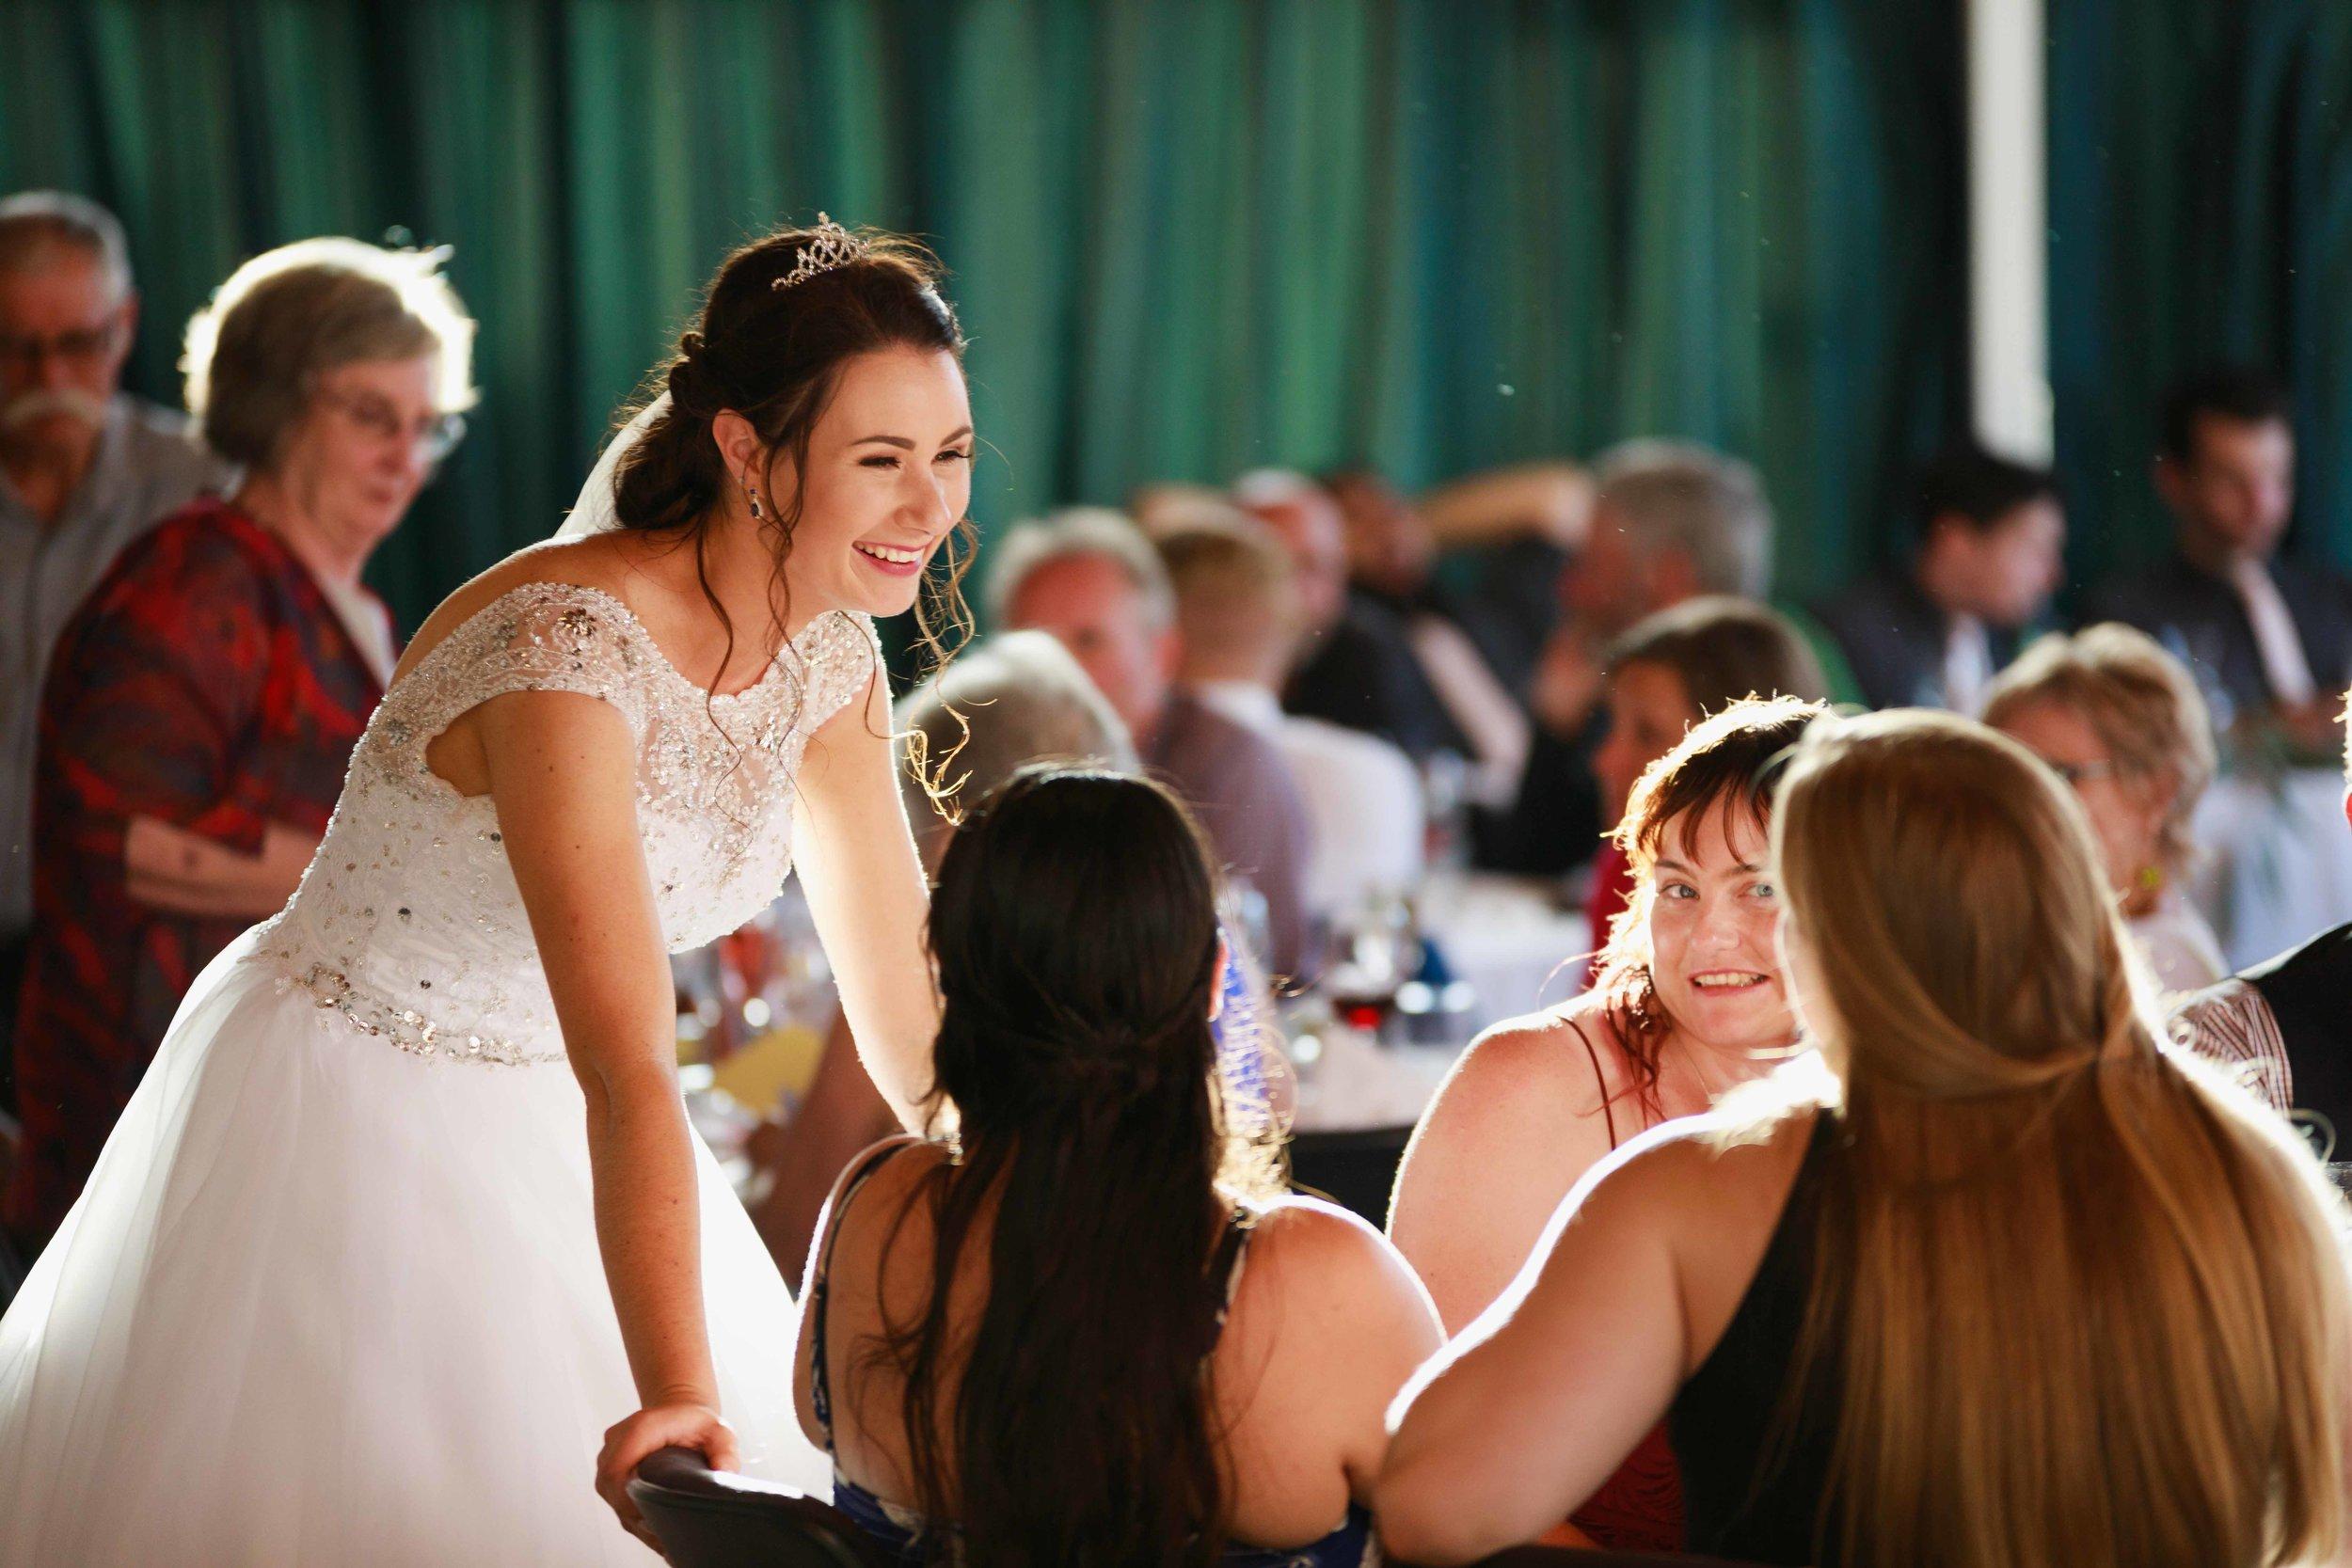 the-chalet-highlight-wedding-photography-palmerston-north-171.jpg